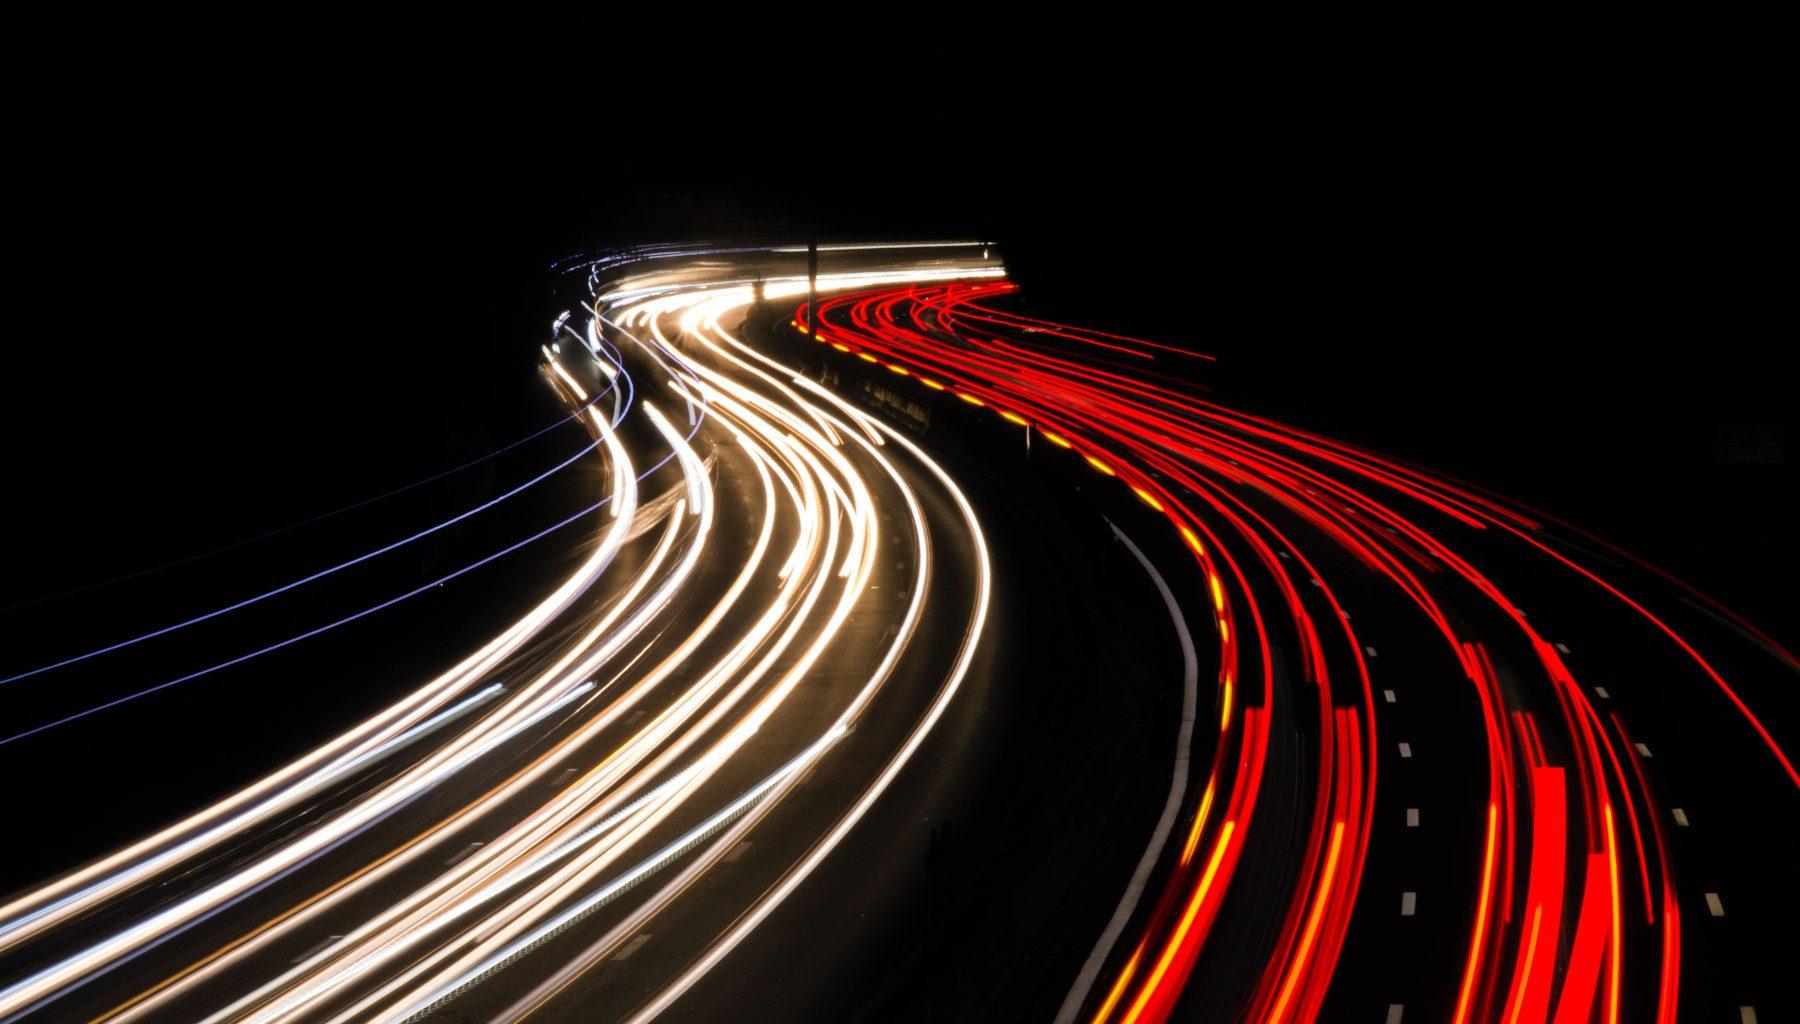 Light | Speed | Road